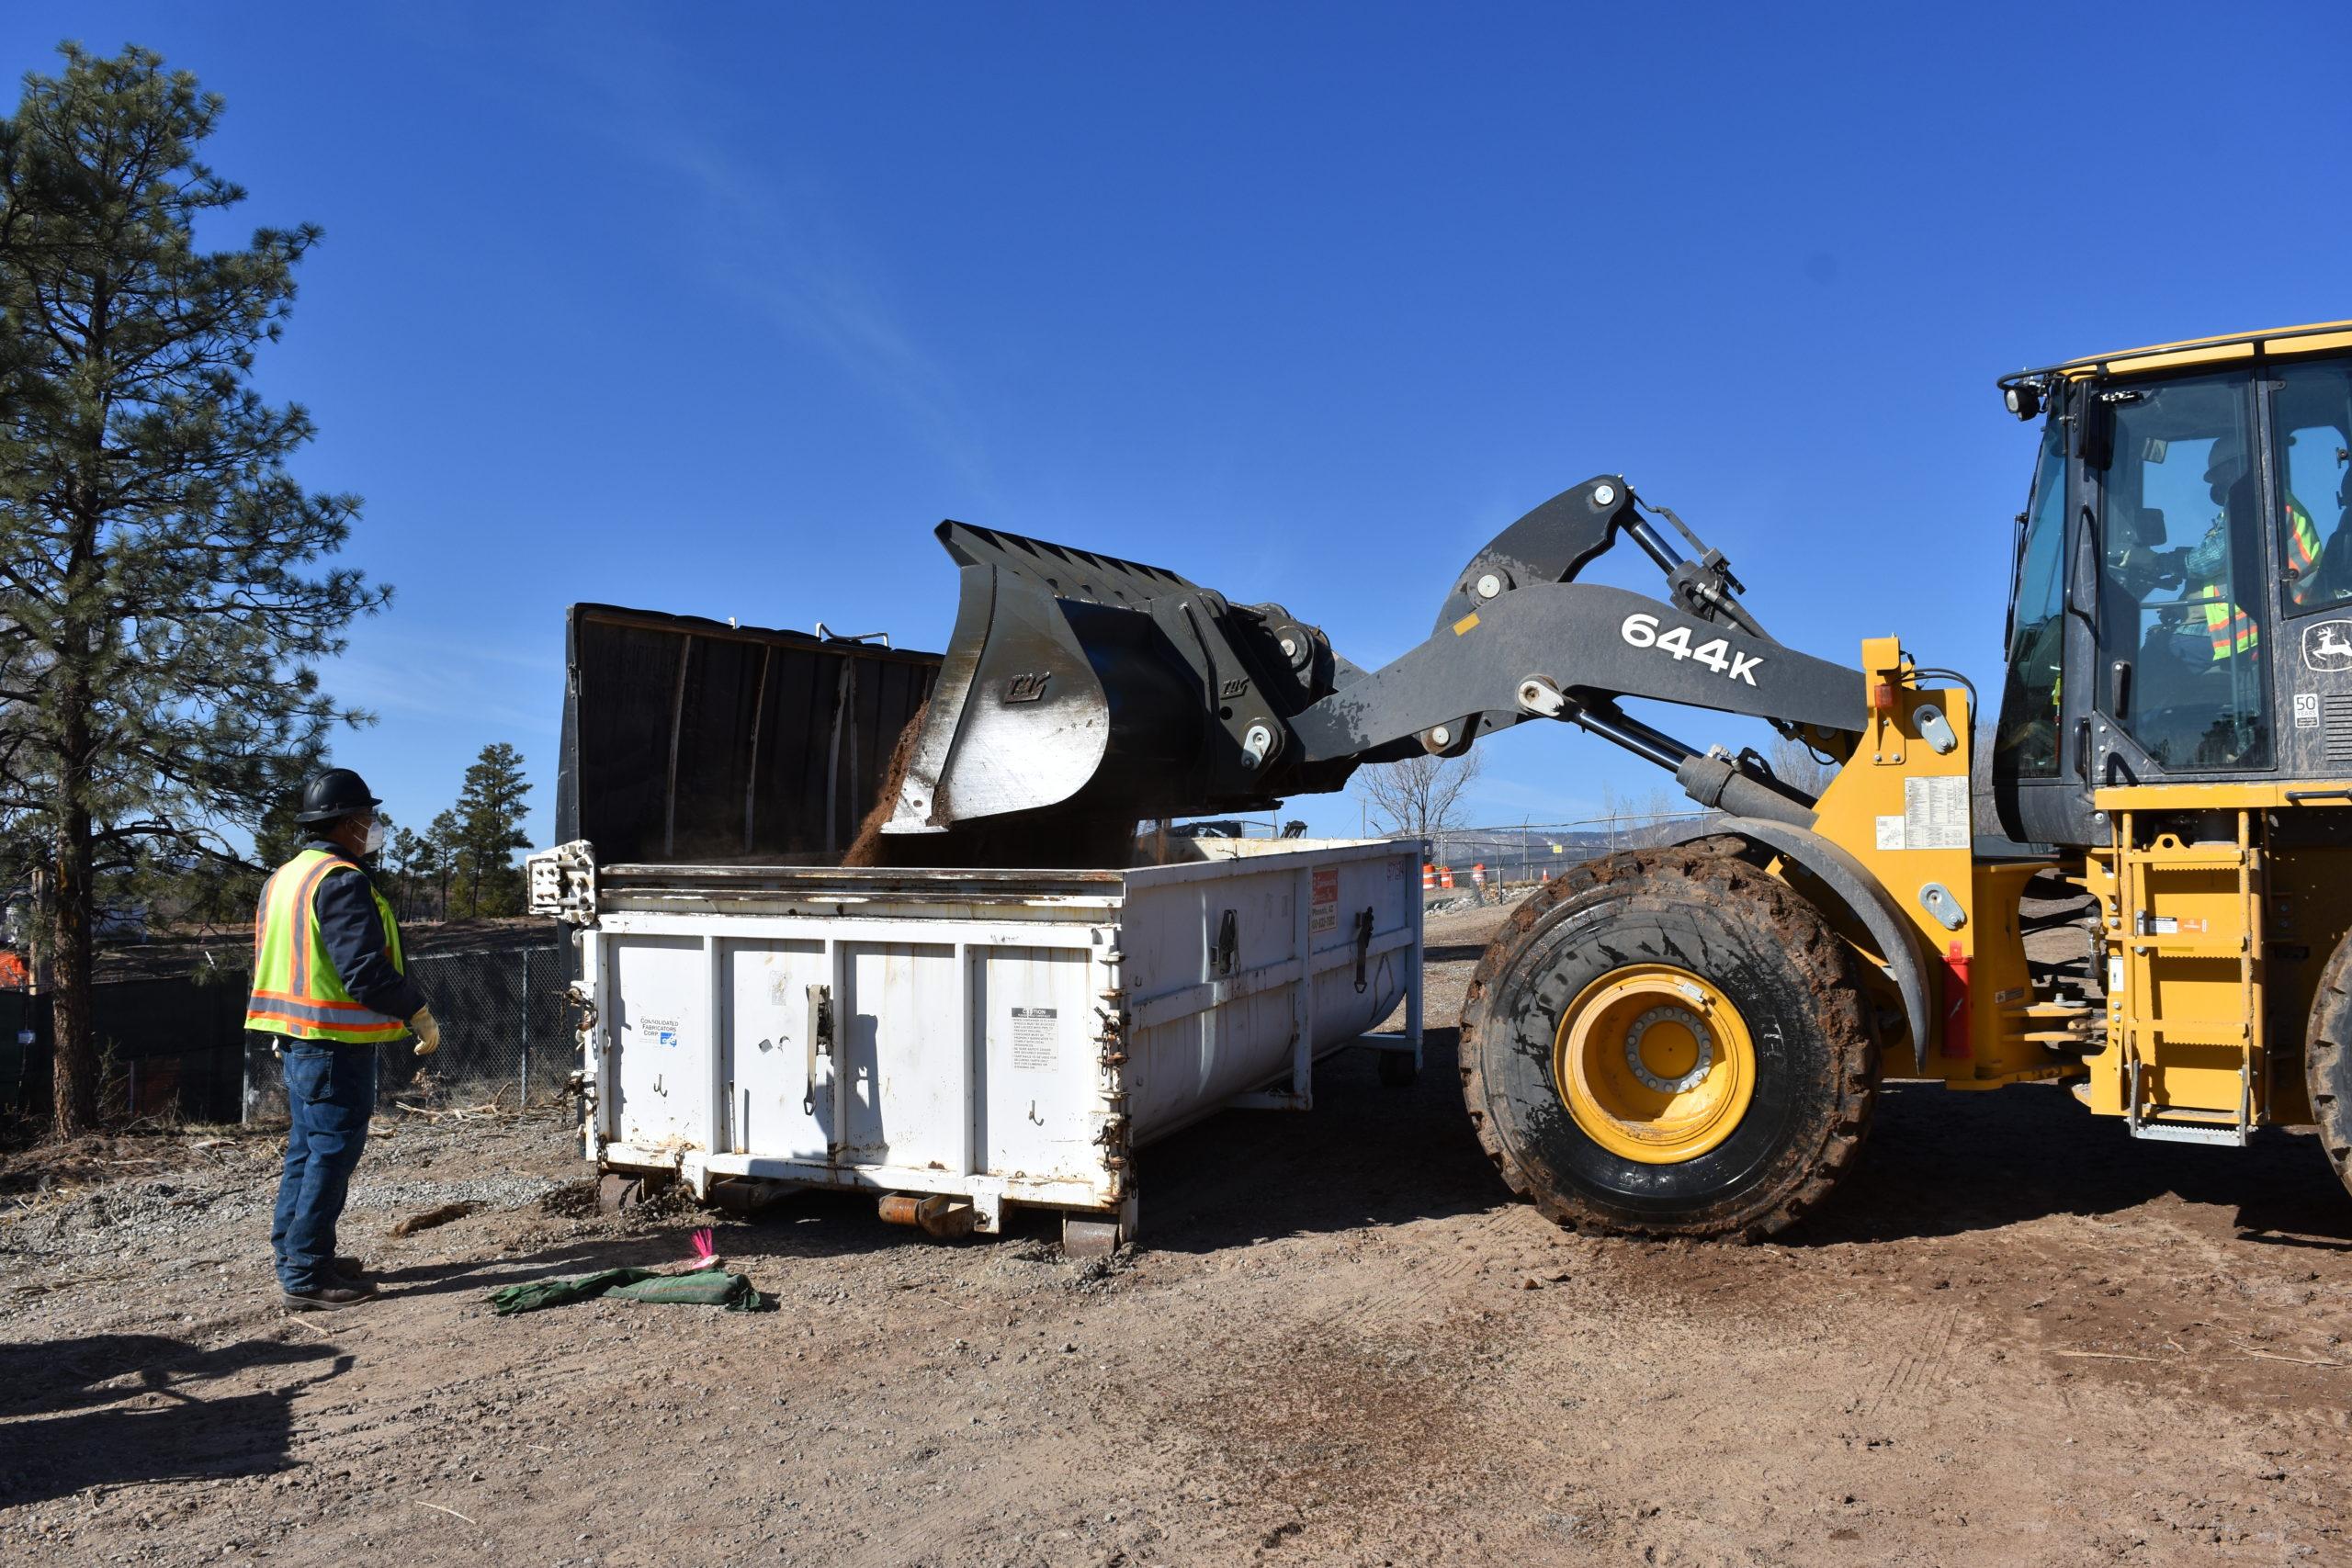 Depositing dirt into bin